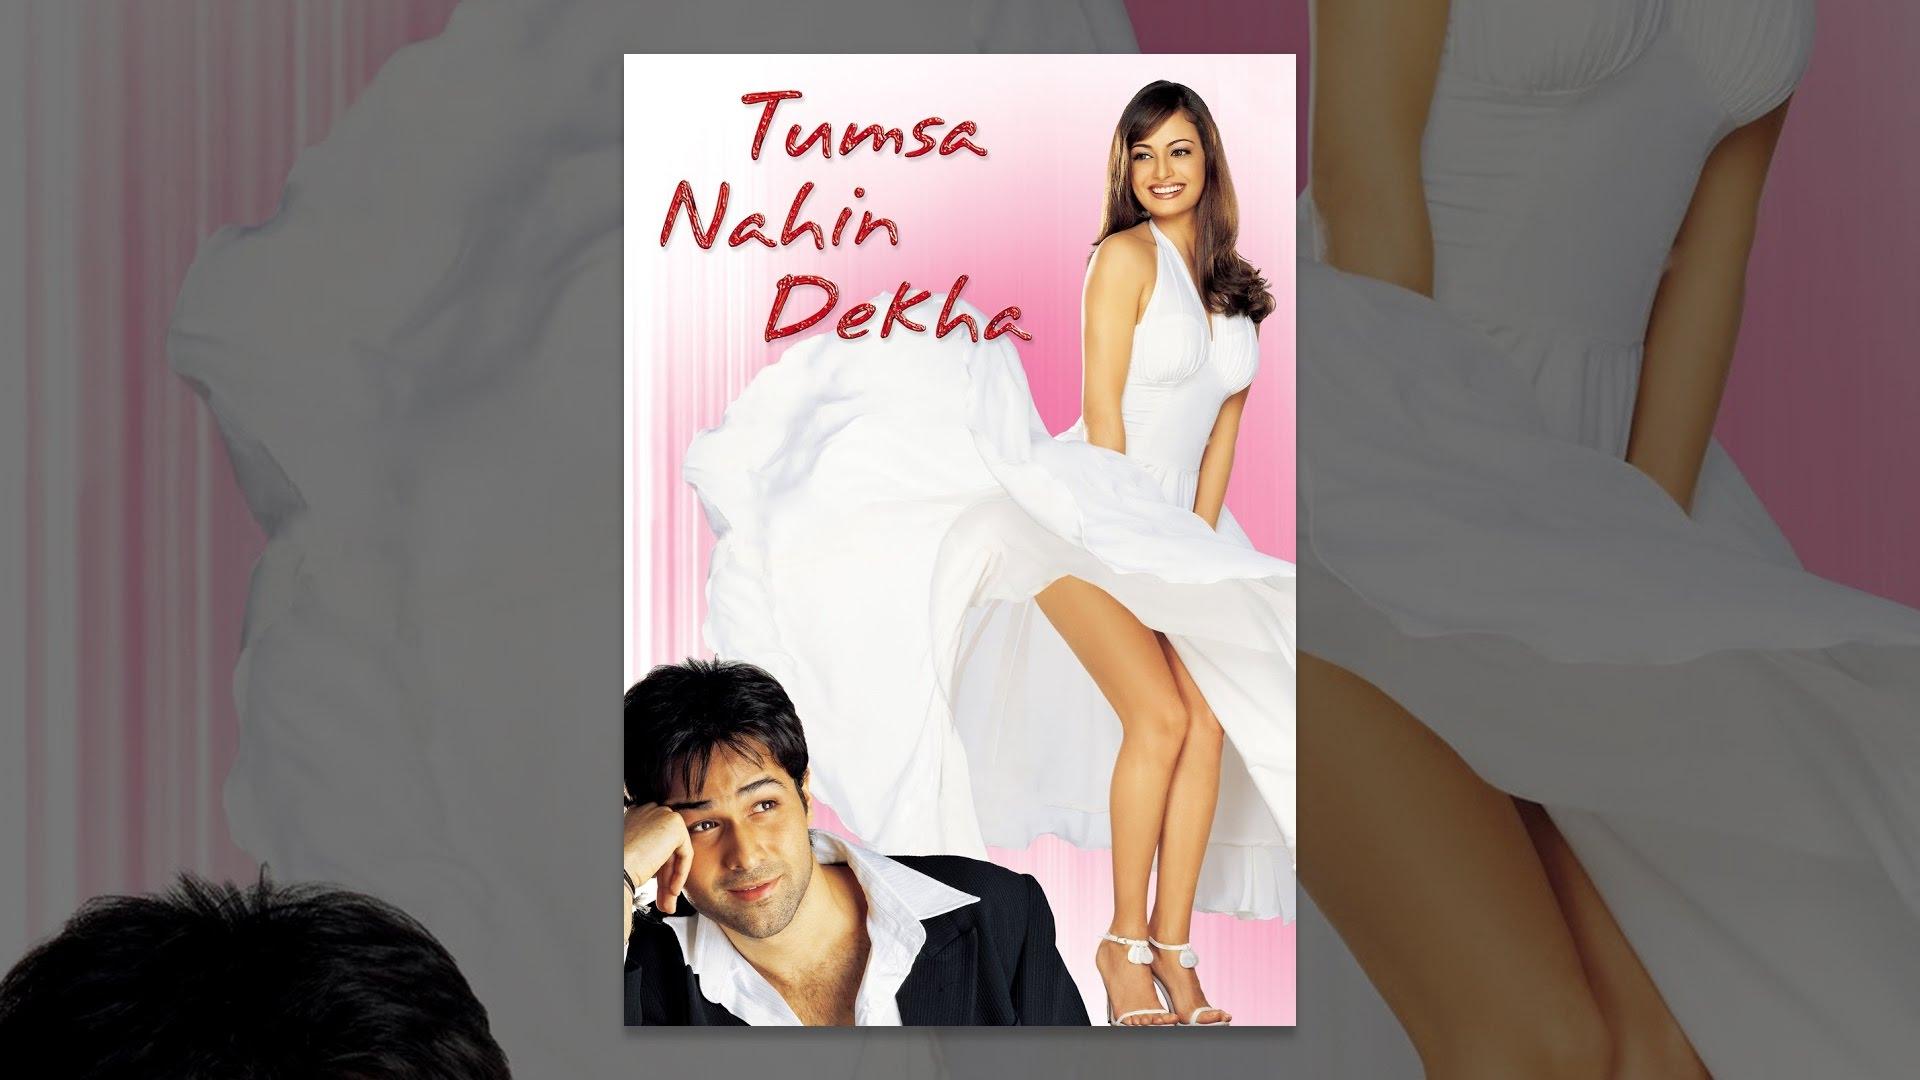 Tumsa nahin dekha video songs download.